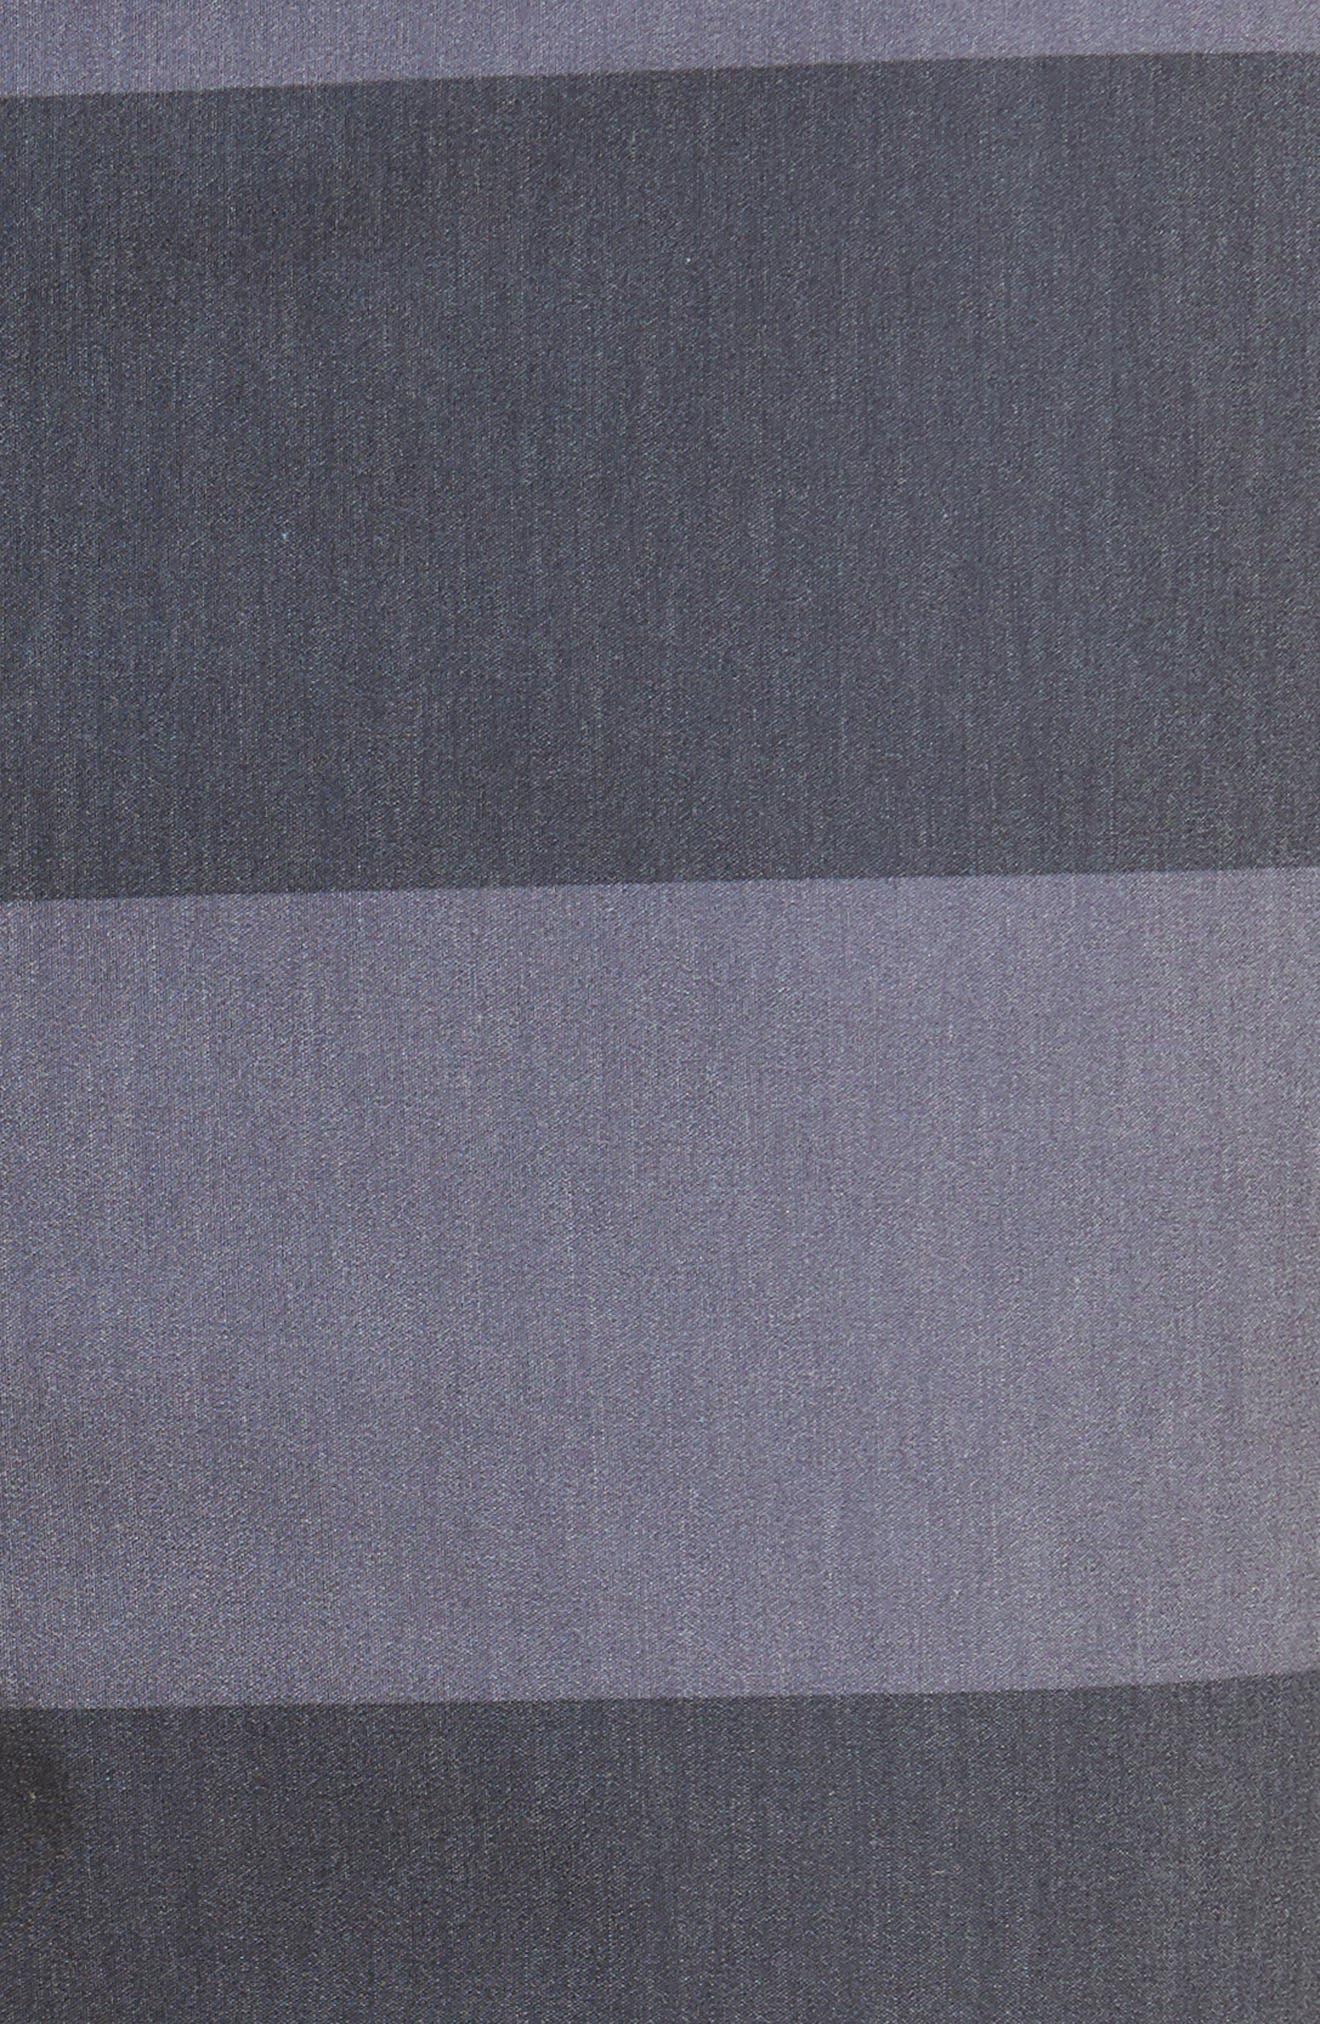 Homage Board Shorts,                             Alternate thumbnail 5, color,                             Black